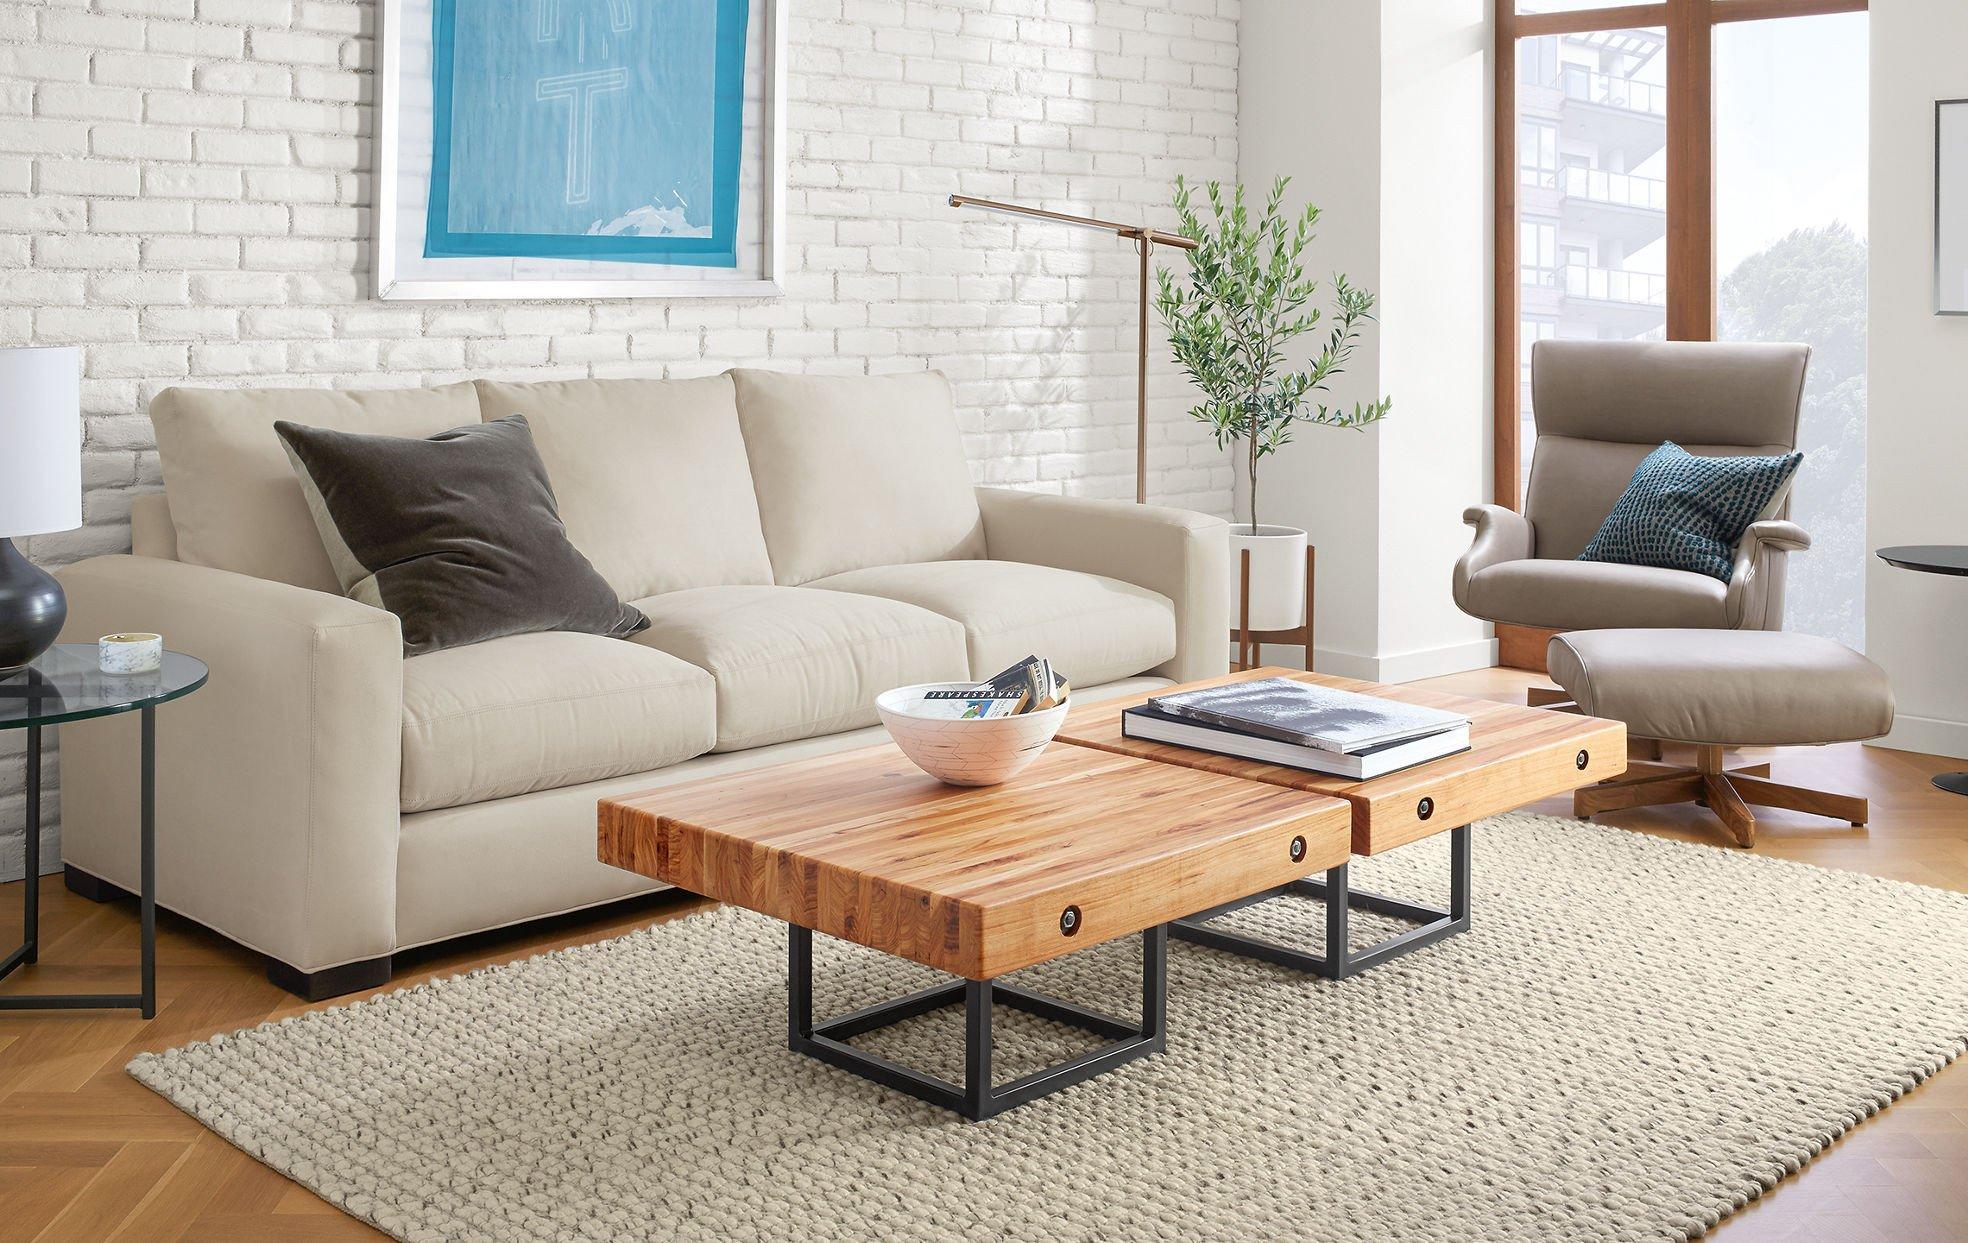 Rug for Living Room Ideas Elegant Modern Rugs Rugs Room & Board